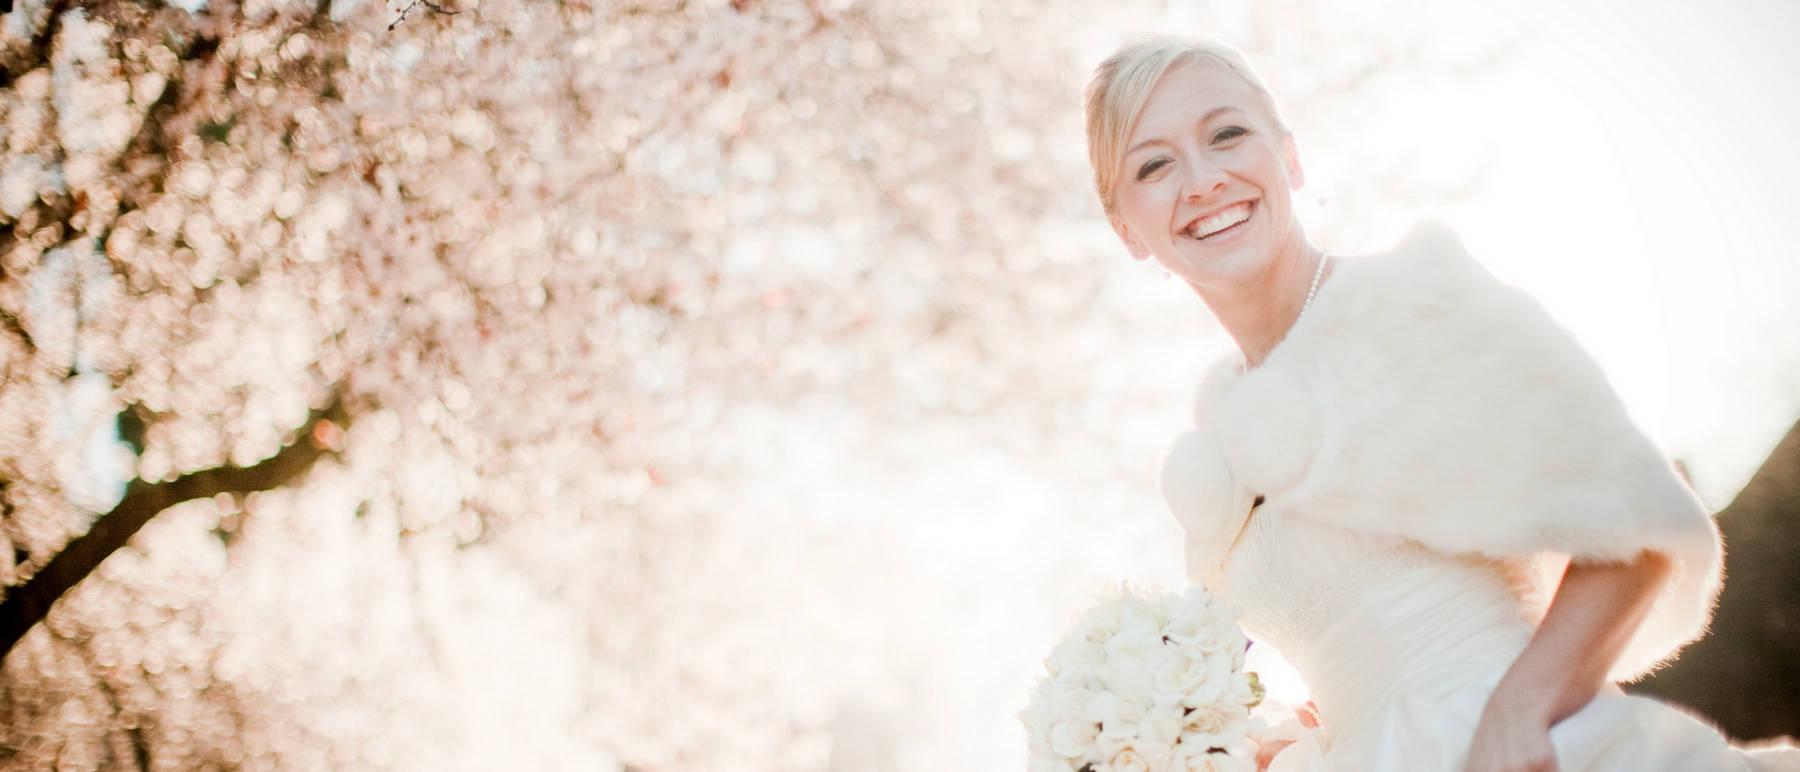 johnandjoseph-wedding-photographer-hz-slider-102